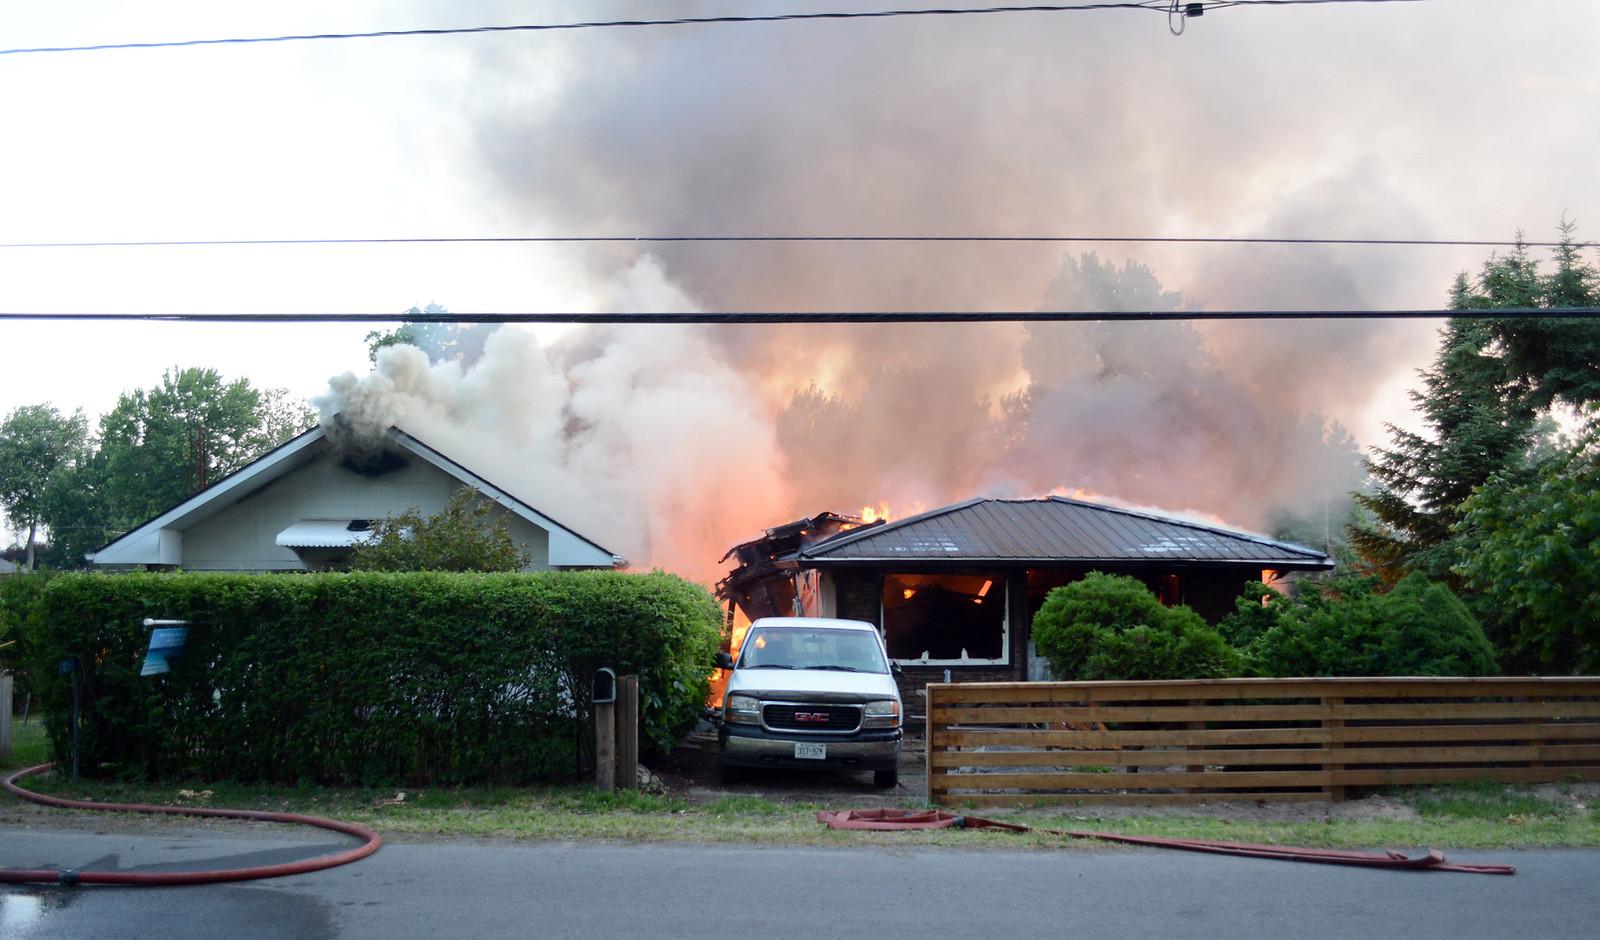 Lakeshore Rd. fire - Monday, June 20